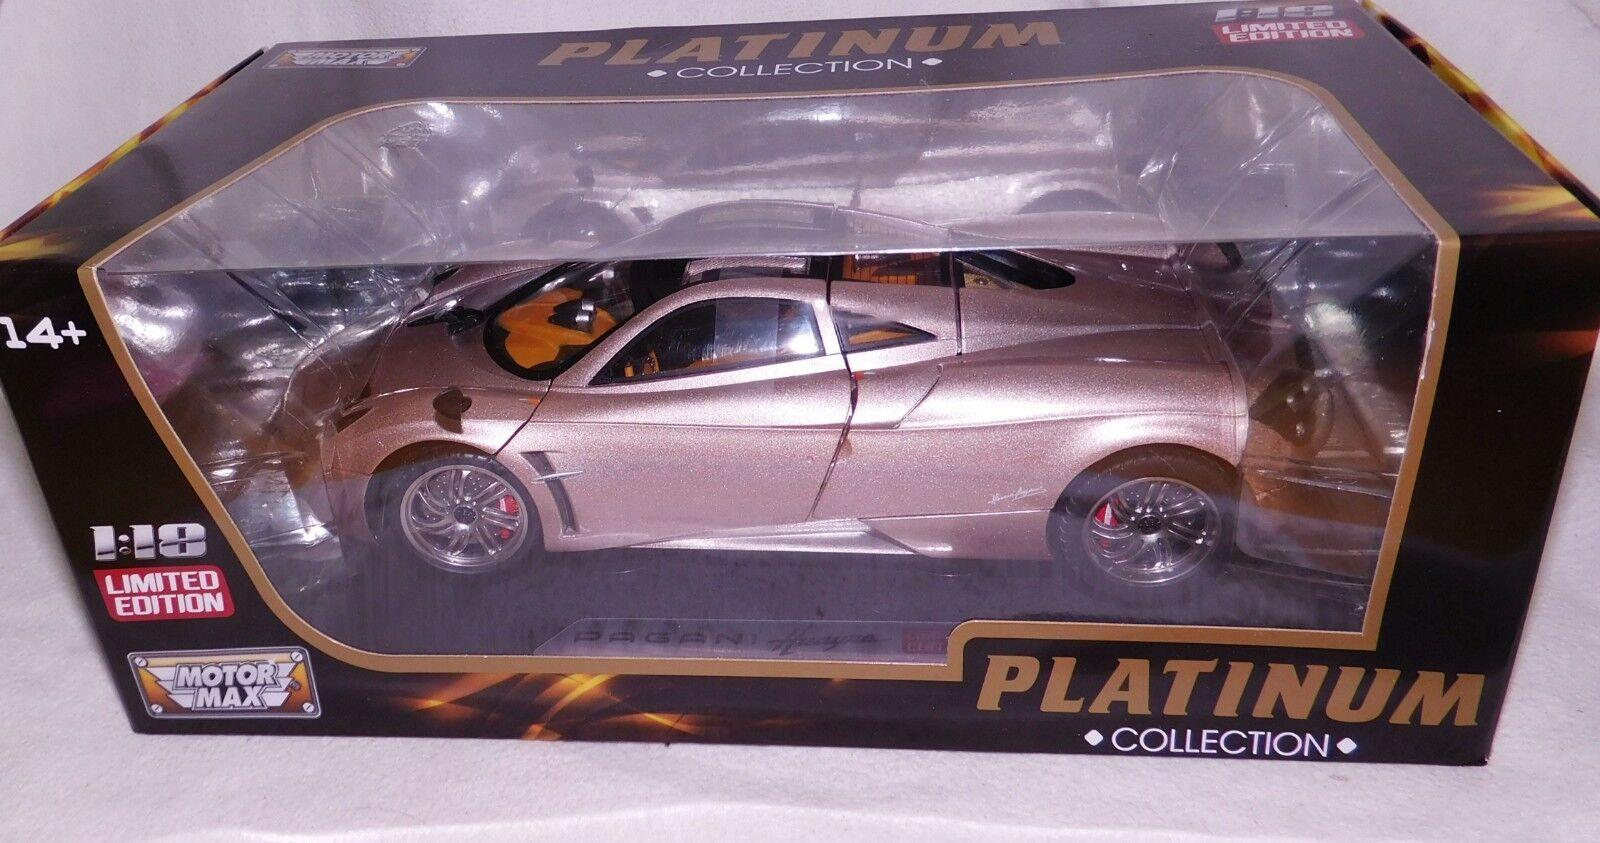 Motormax 1:18 metalmodell PAGANI HUAYRA Platinum Limited Edition-Neuf dans dans dans neuf dans sa boîte | à La Mode  b5a97d